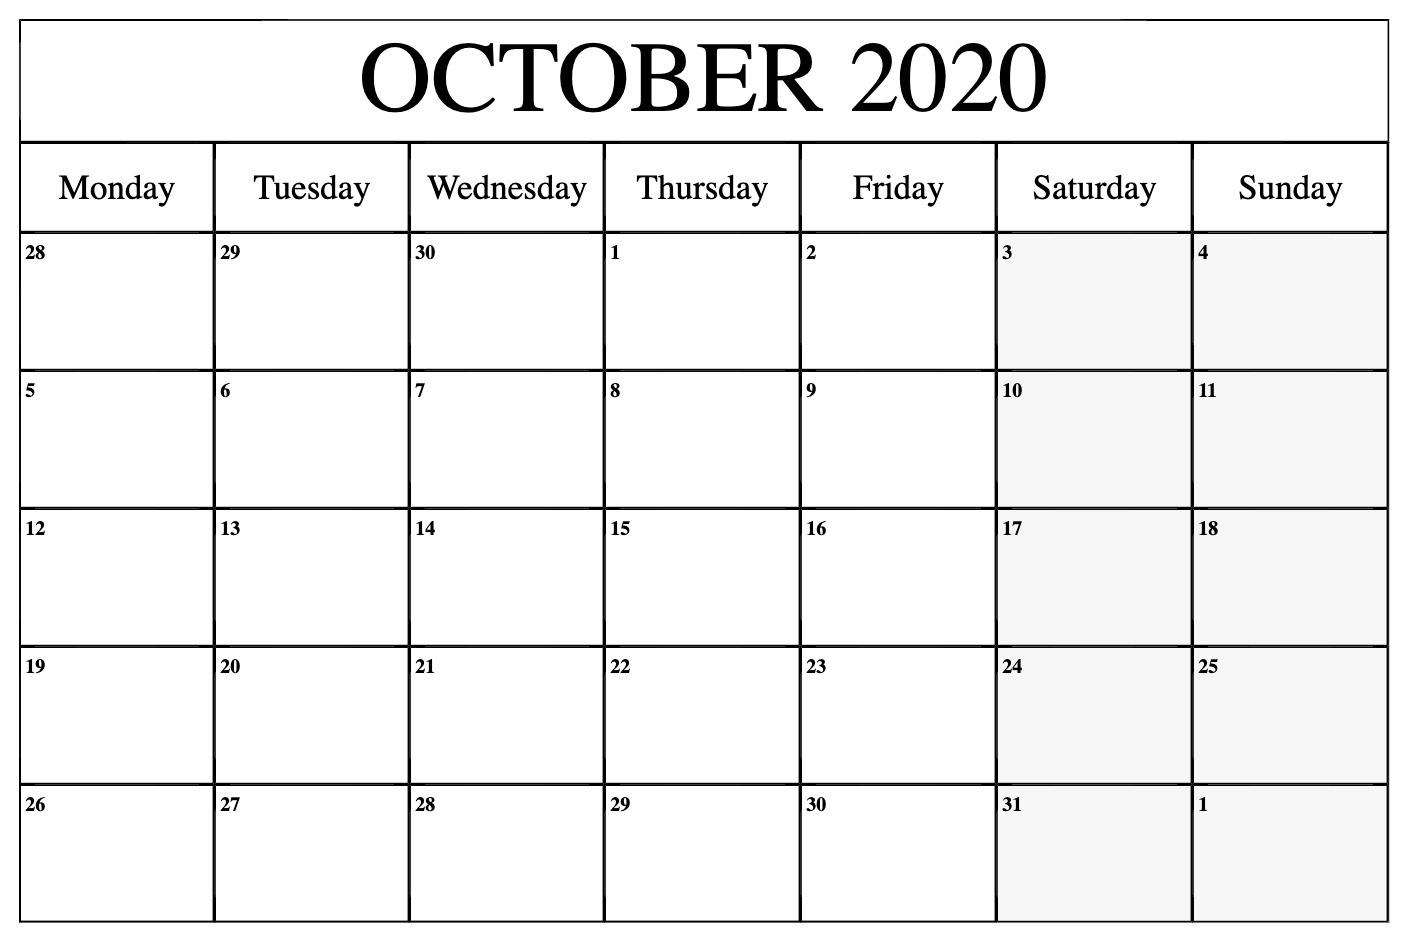 October 2020 Calendar Template Word, Pdf, Excel Format